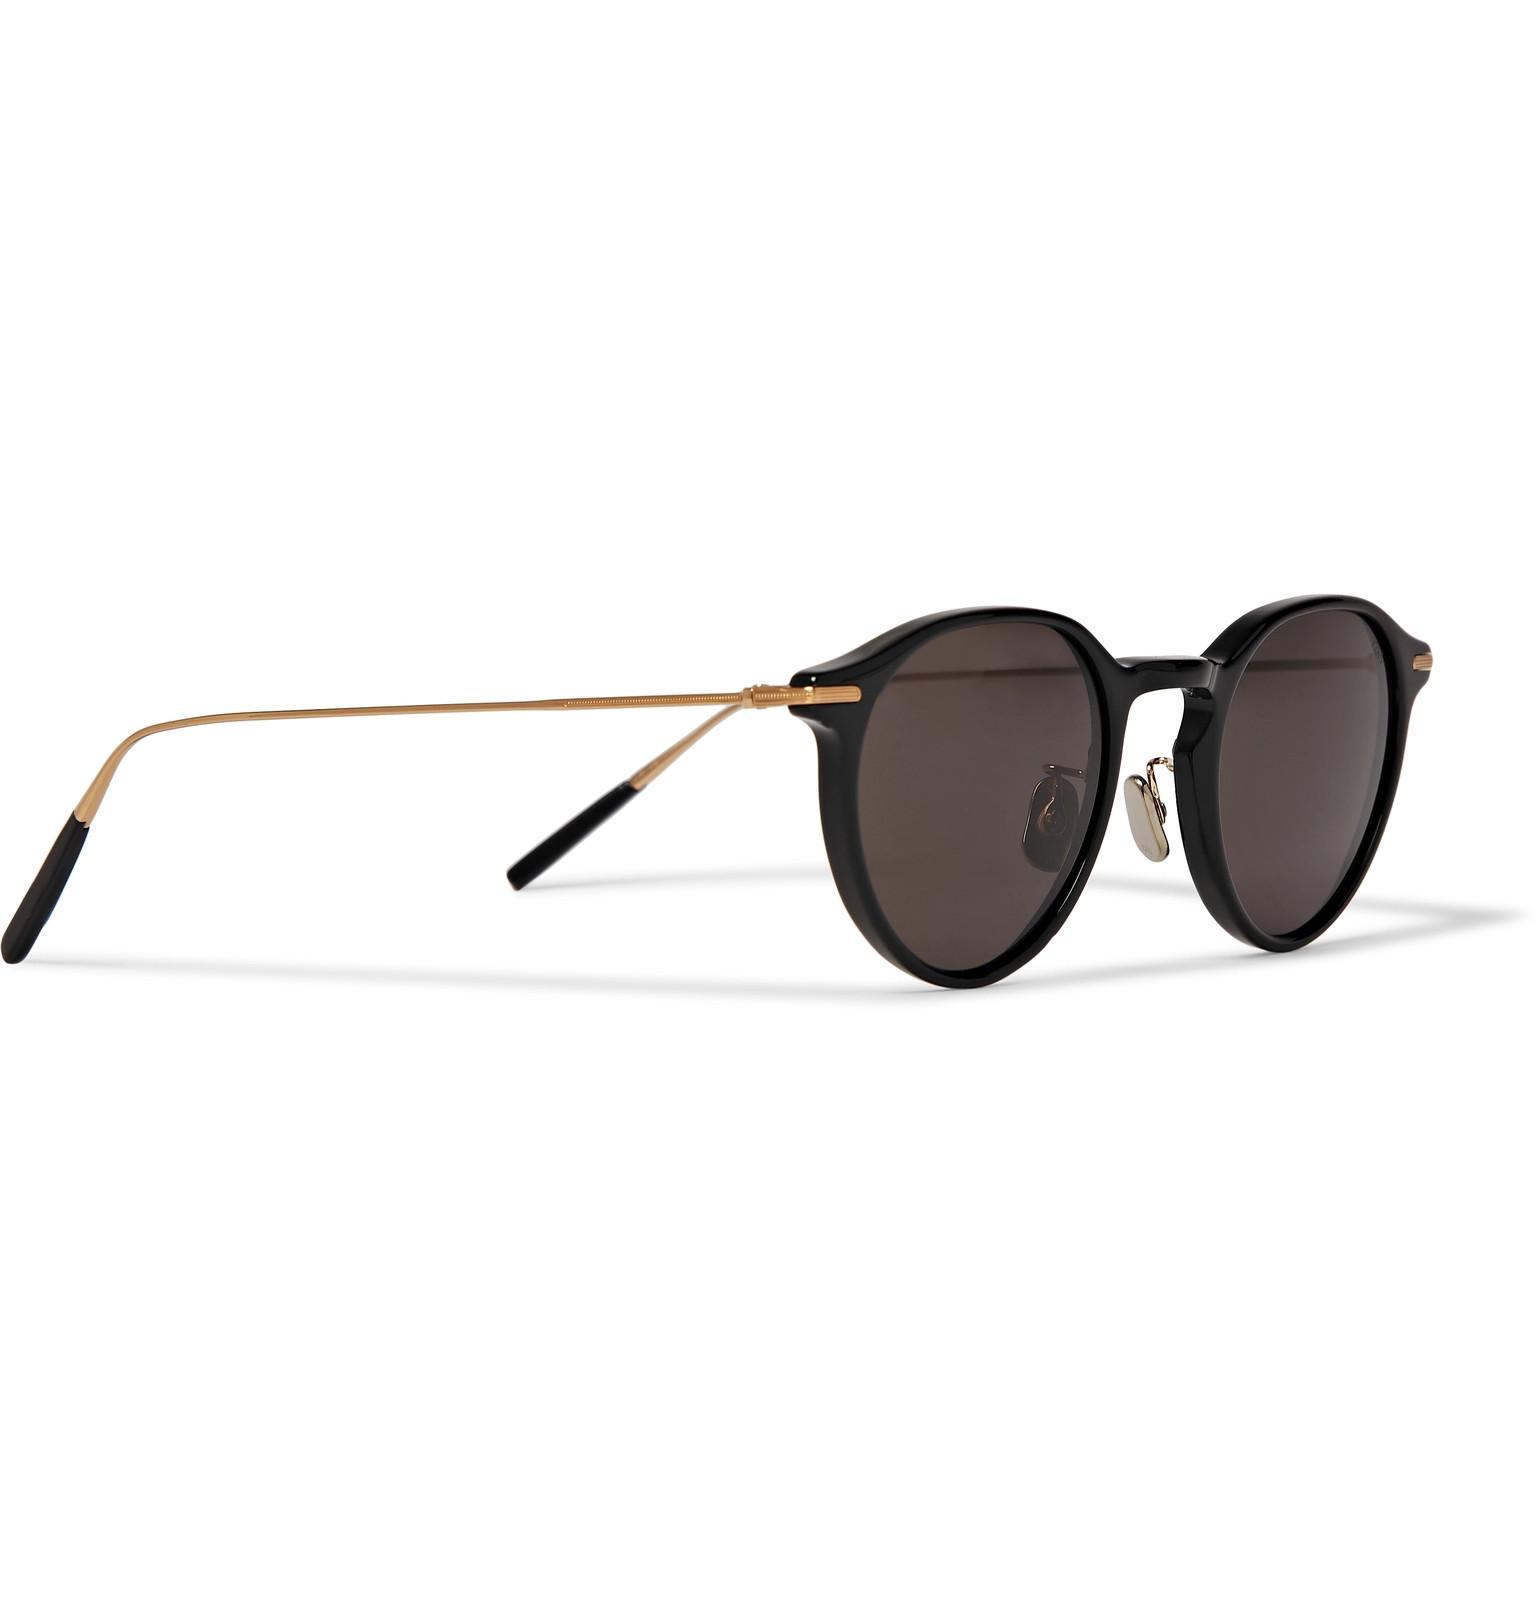 58b5eebbce7 Eyevan 7285 - Black Round-frame Acetate And Gold-tone Sunglasses for Men -.  View fullscreen